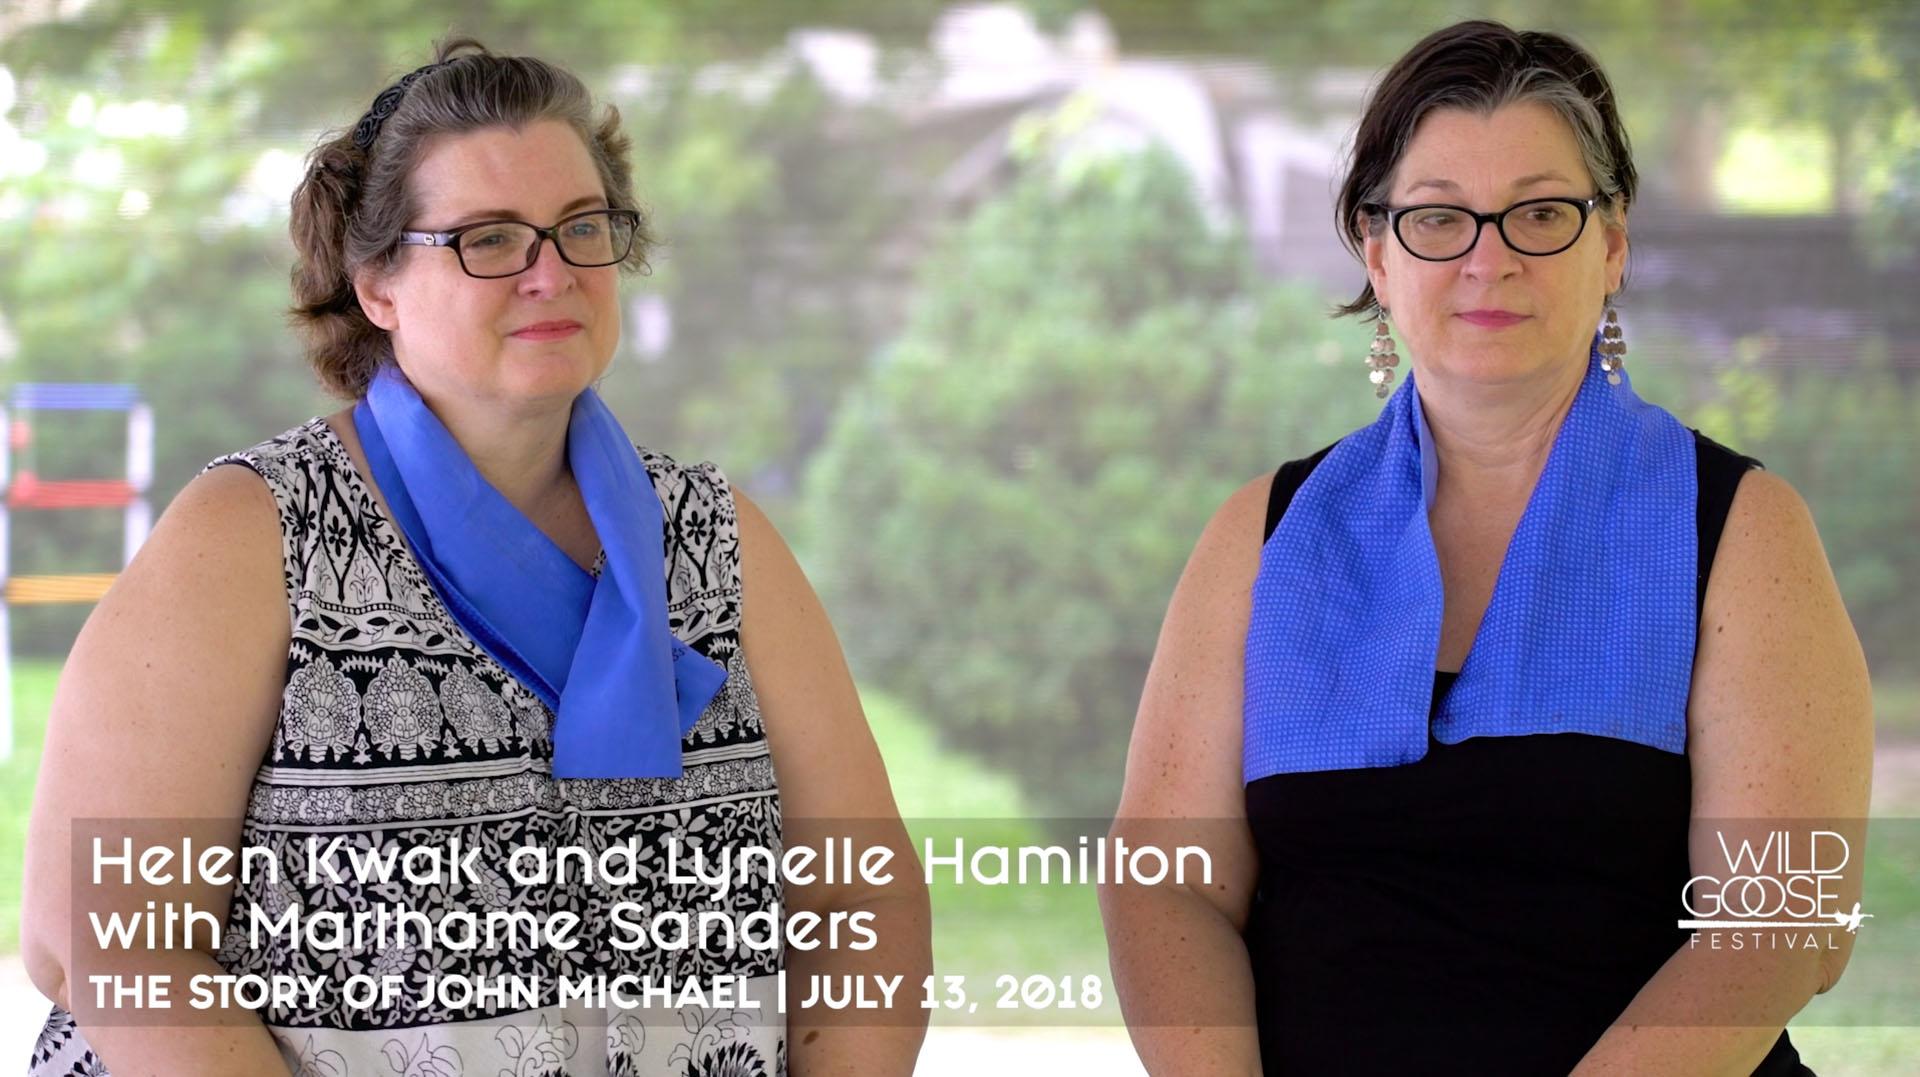 John Michael's Story Helen Kwak & Lynelle Hamilton